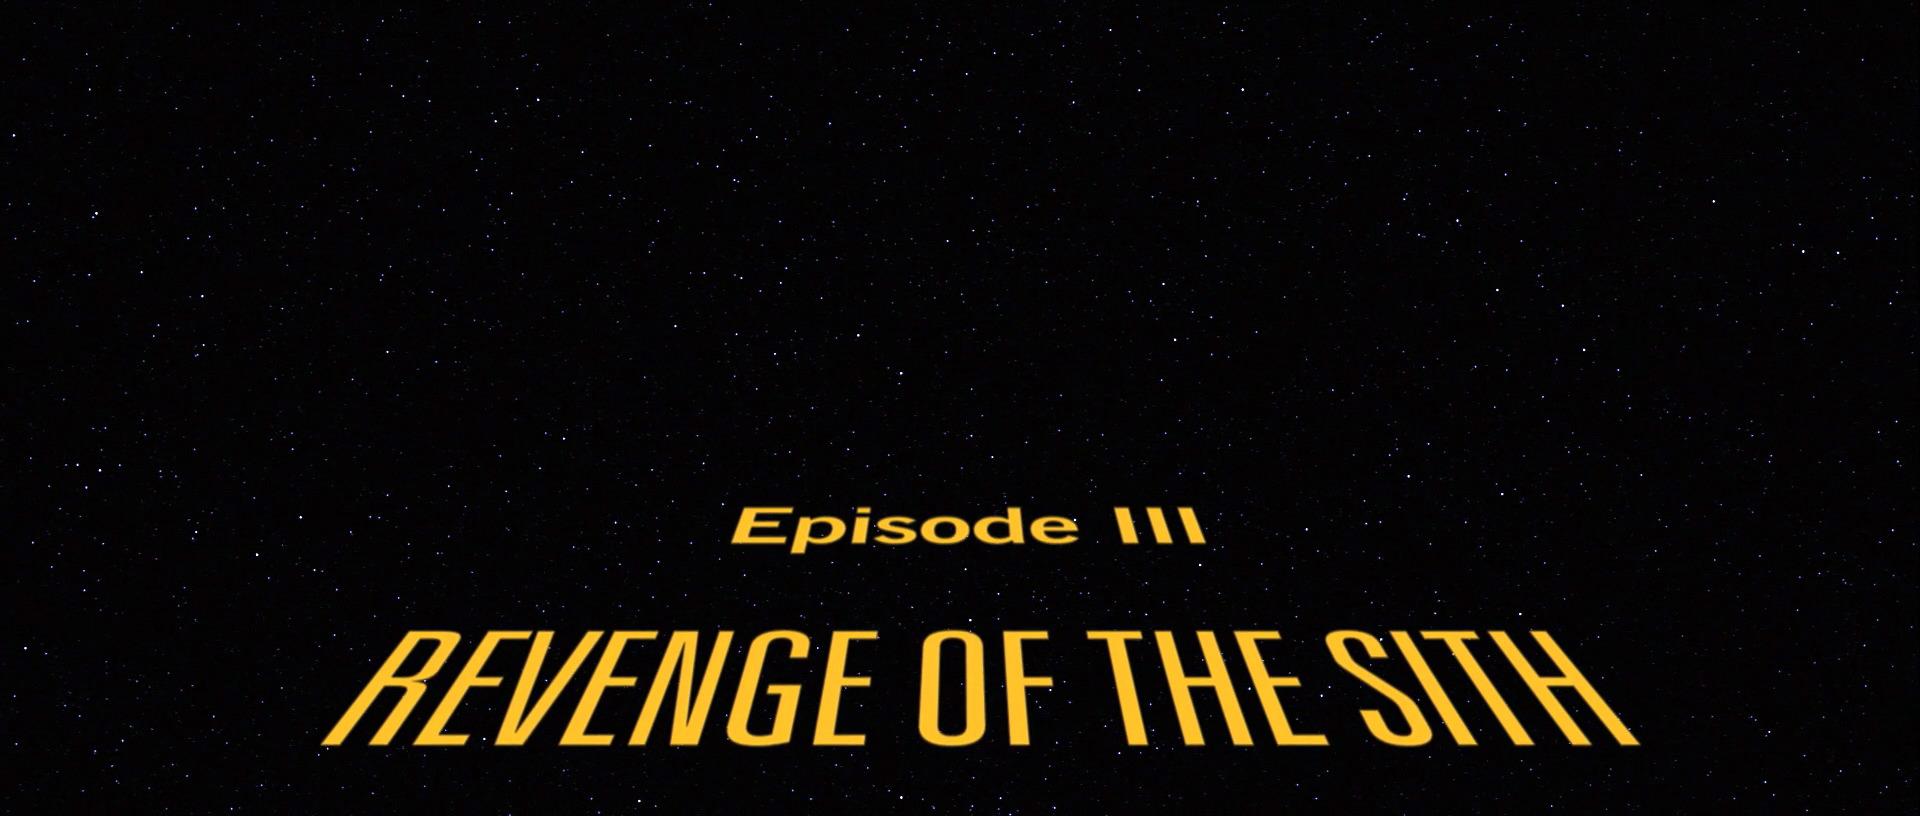 Star Wars Episode Iii Revenge Of The Sith 2005 Starwars Screencaps Com